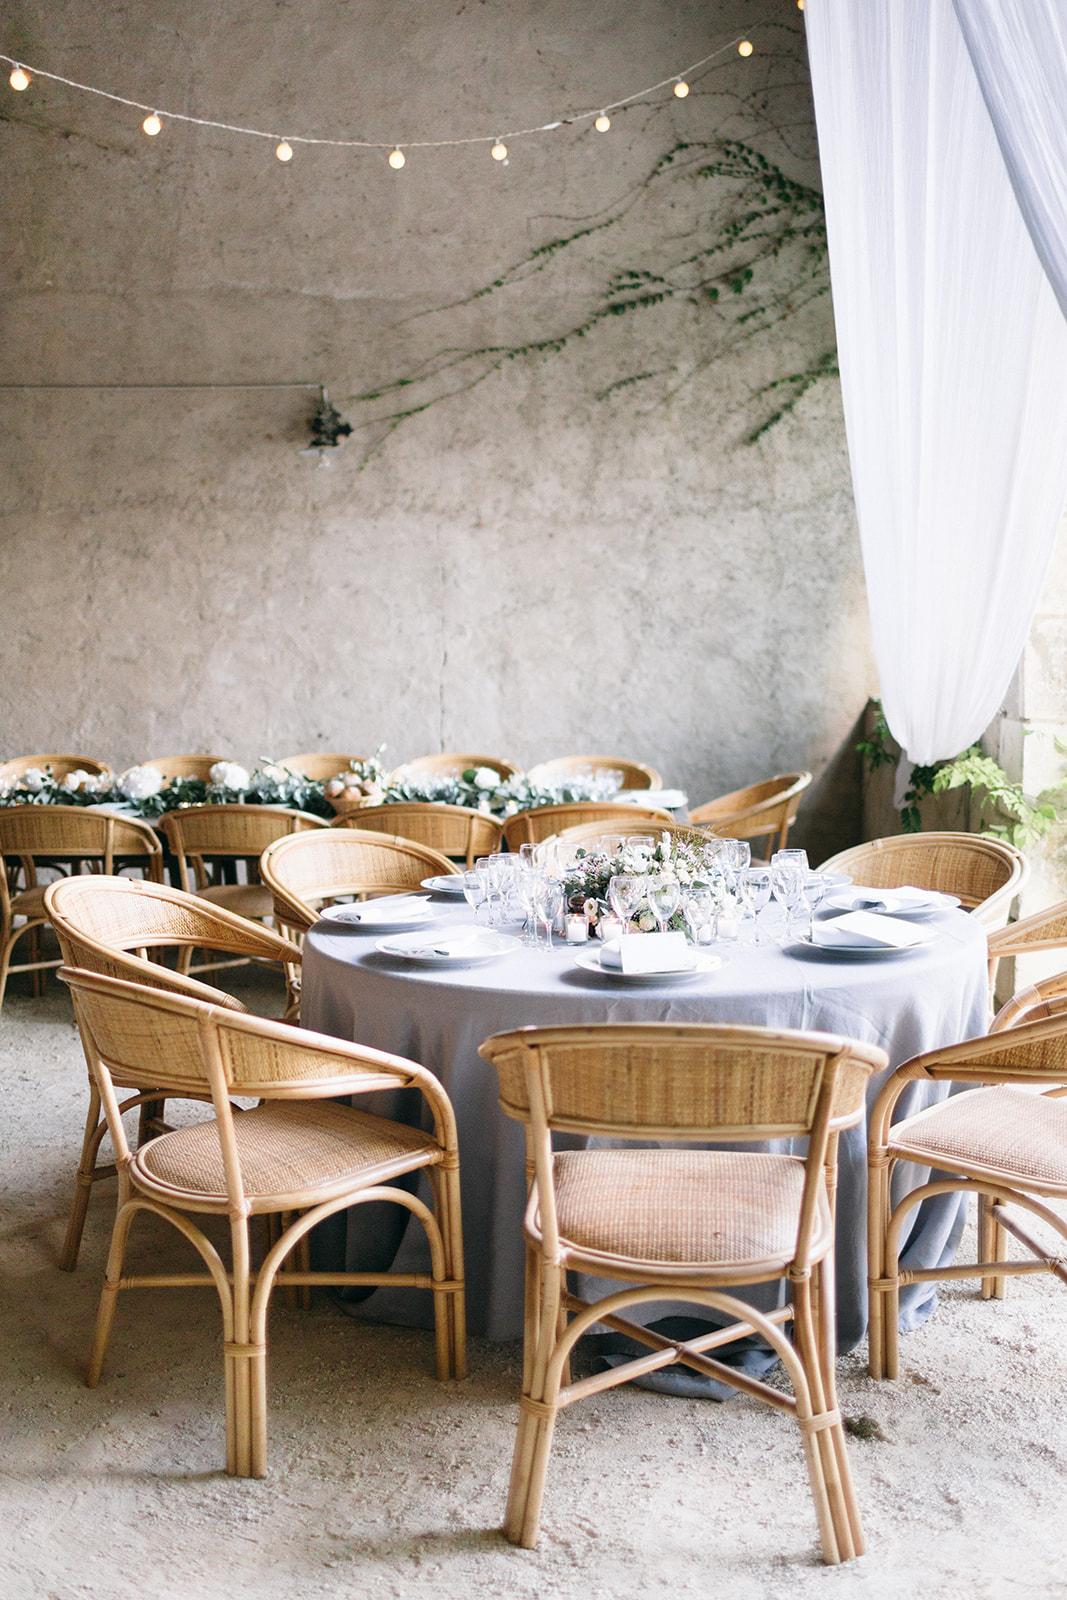 French Chateau Wedding, Events by Reagan, France Wedding, Destination Wedding Planner, Table setting